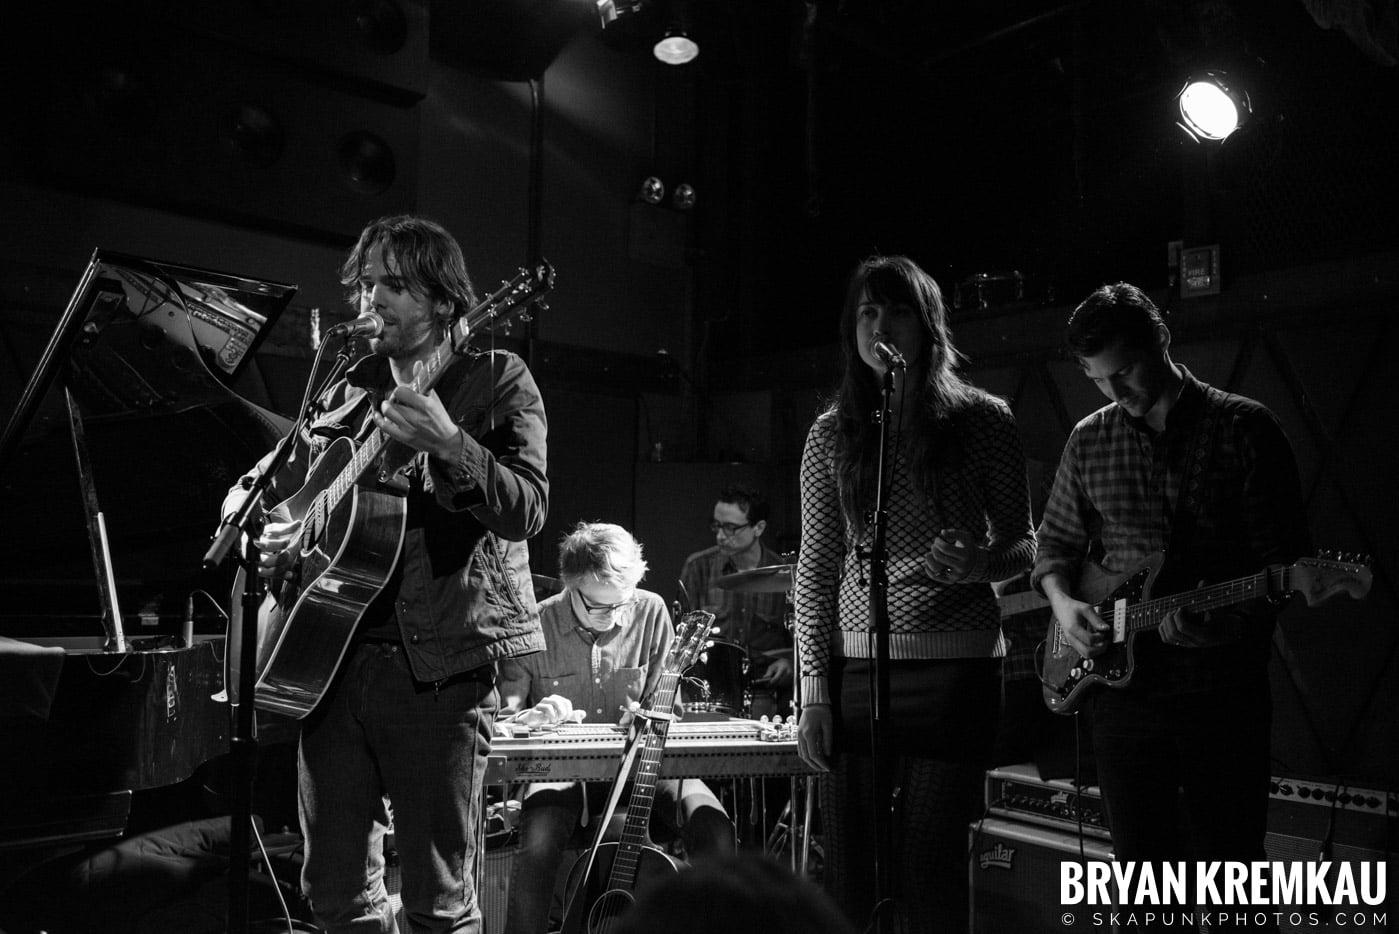 Peter Bradley Adams @ Rockwood Music Hall, NYC - 3.9.13 (6)